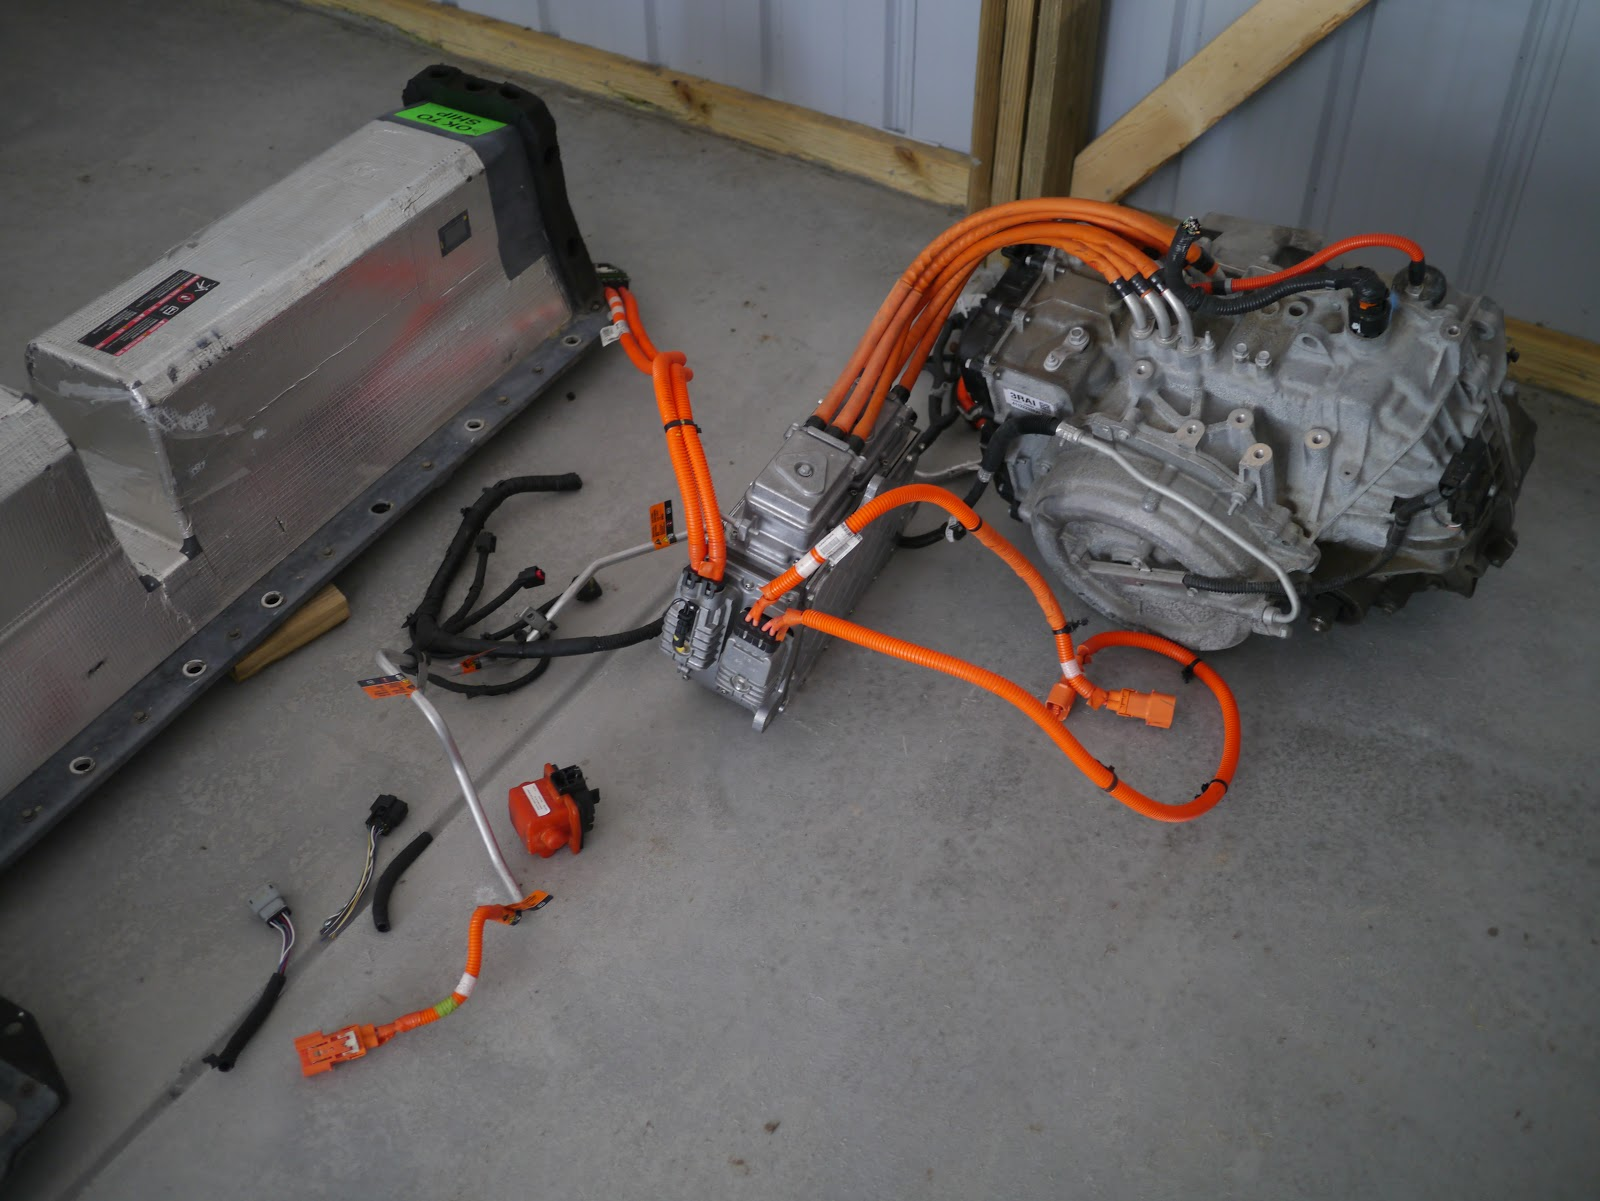 Experimental Vehicle Engineering Chevy Volt drivetrain